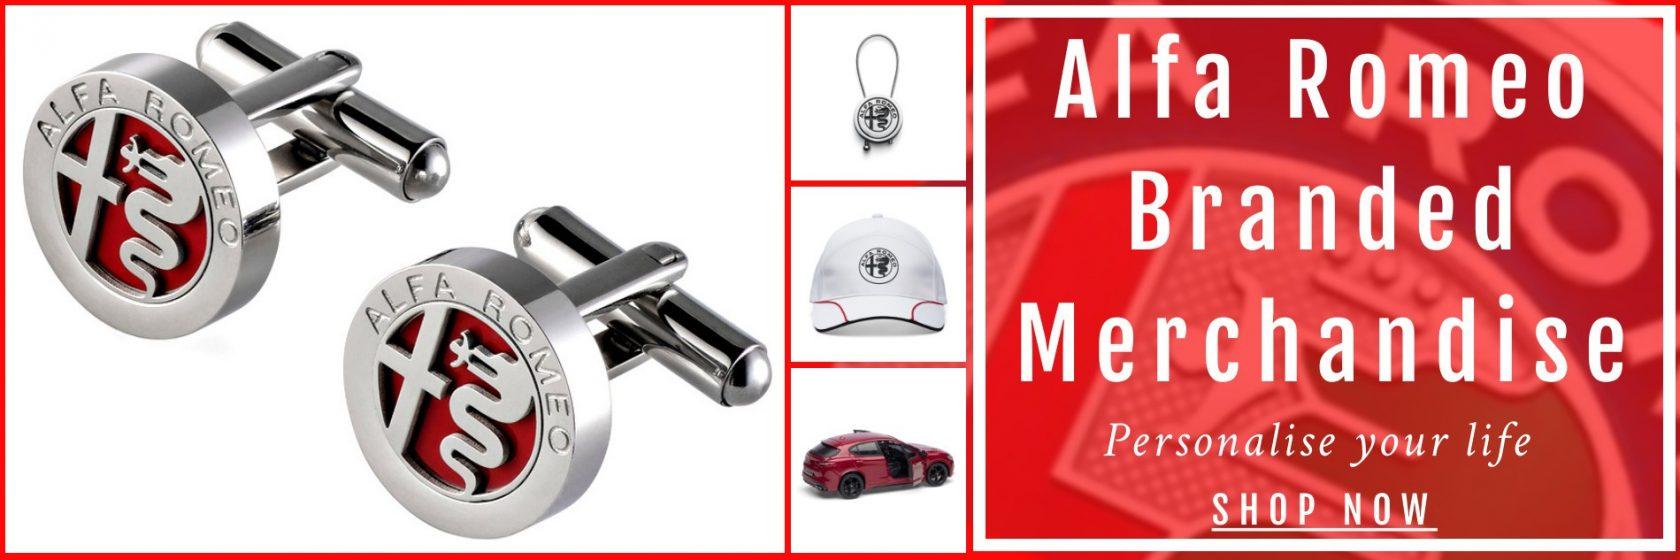 Alfa Romeo Merchandise